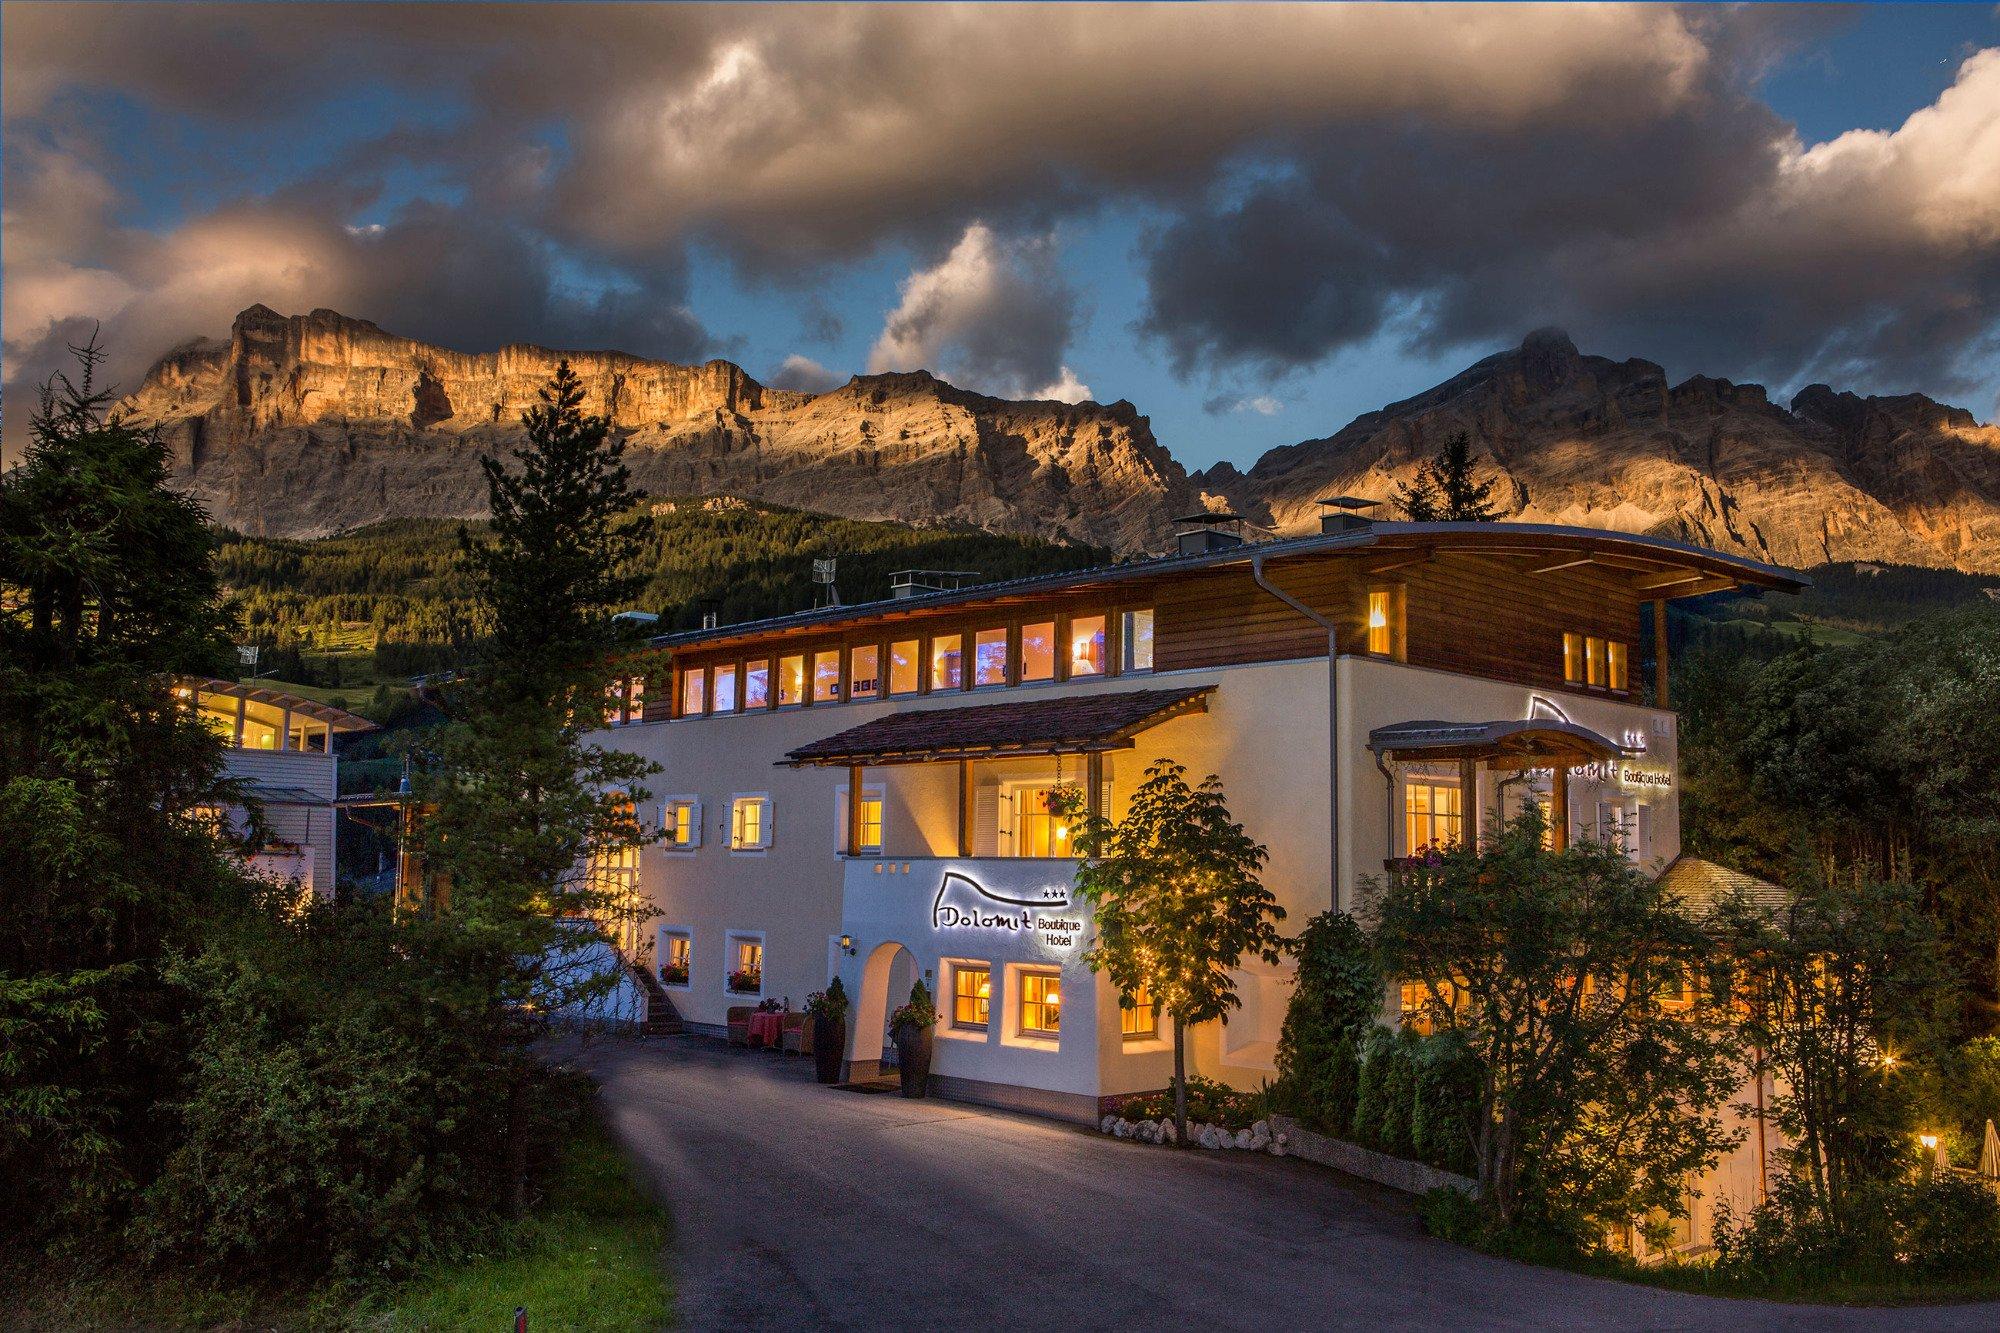 Dolomit Boutique Hotel